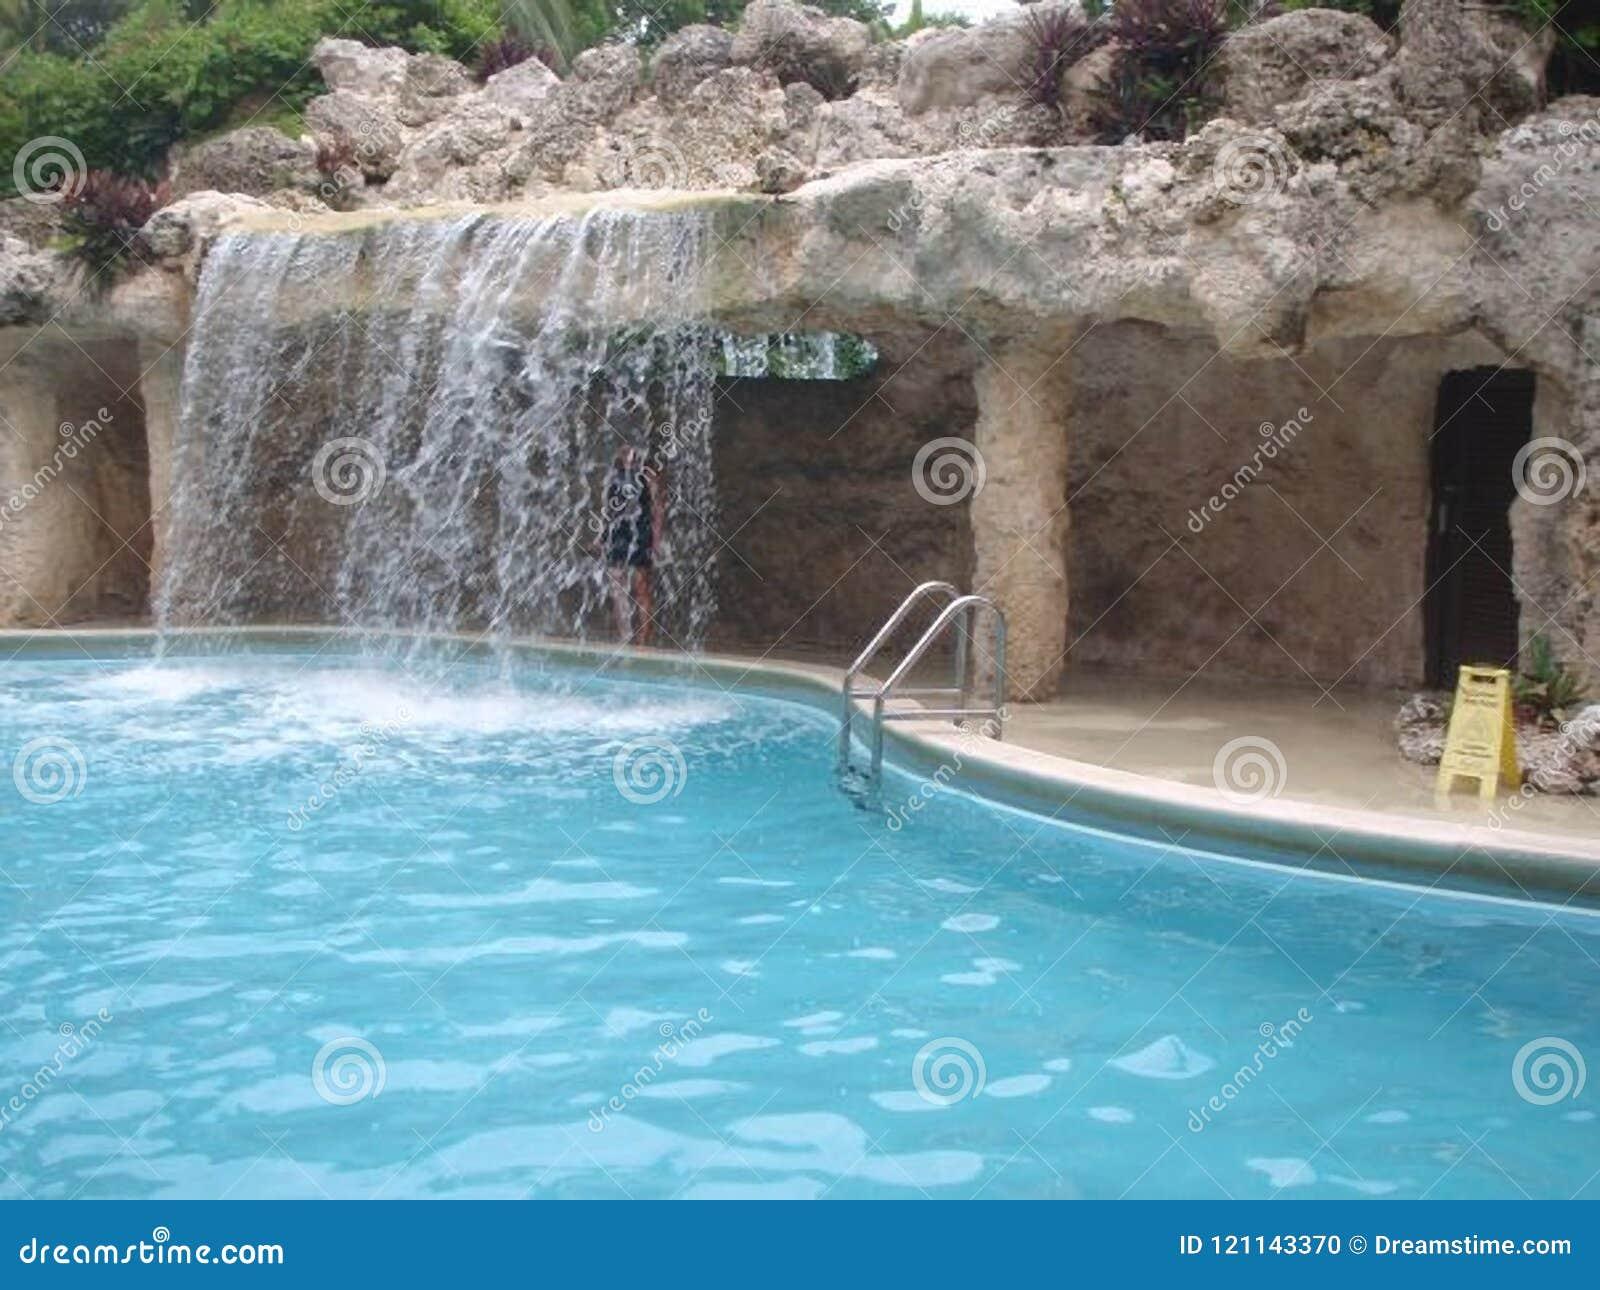 Waterfall At Resort Swimming Pool Stock Photo - Image of vacation ...